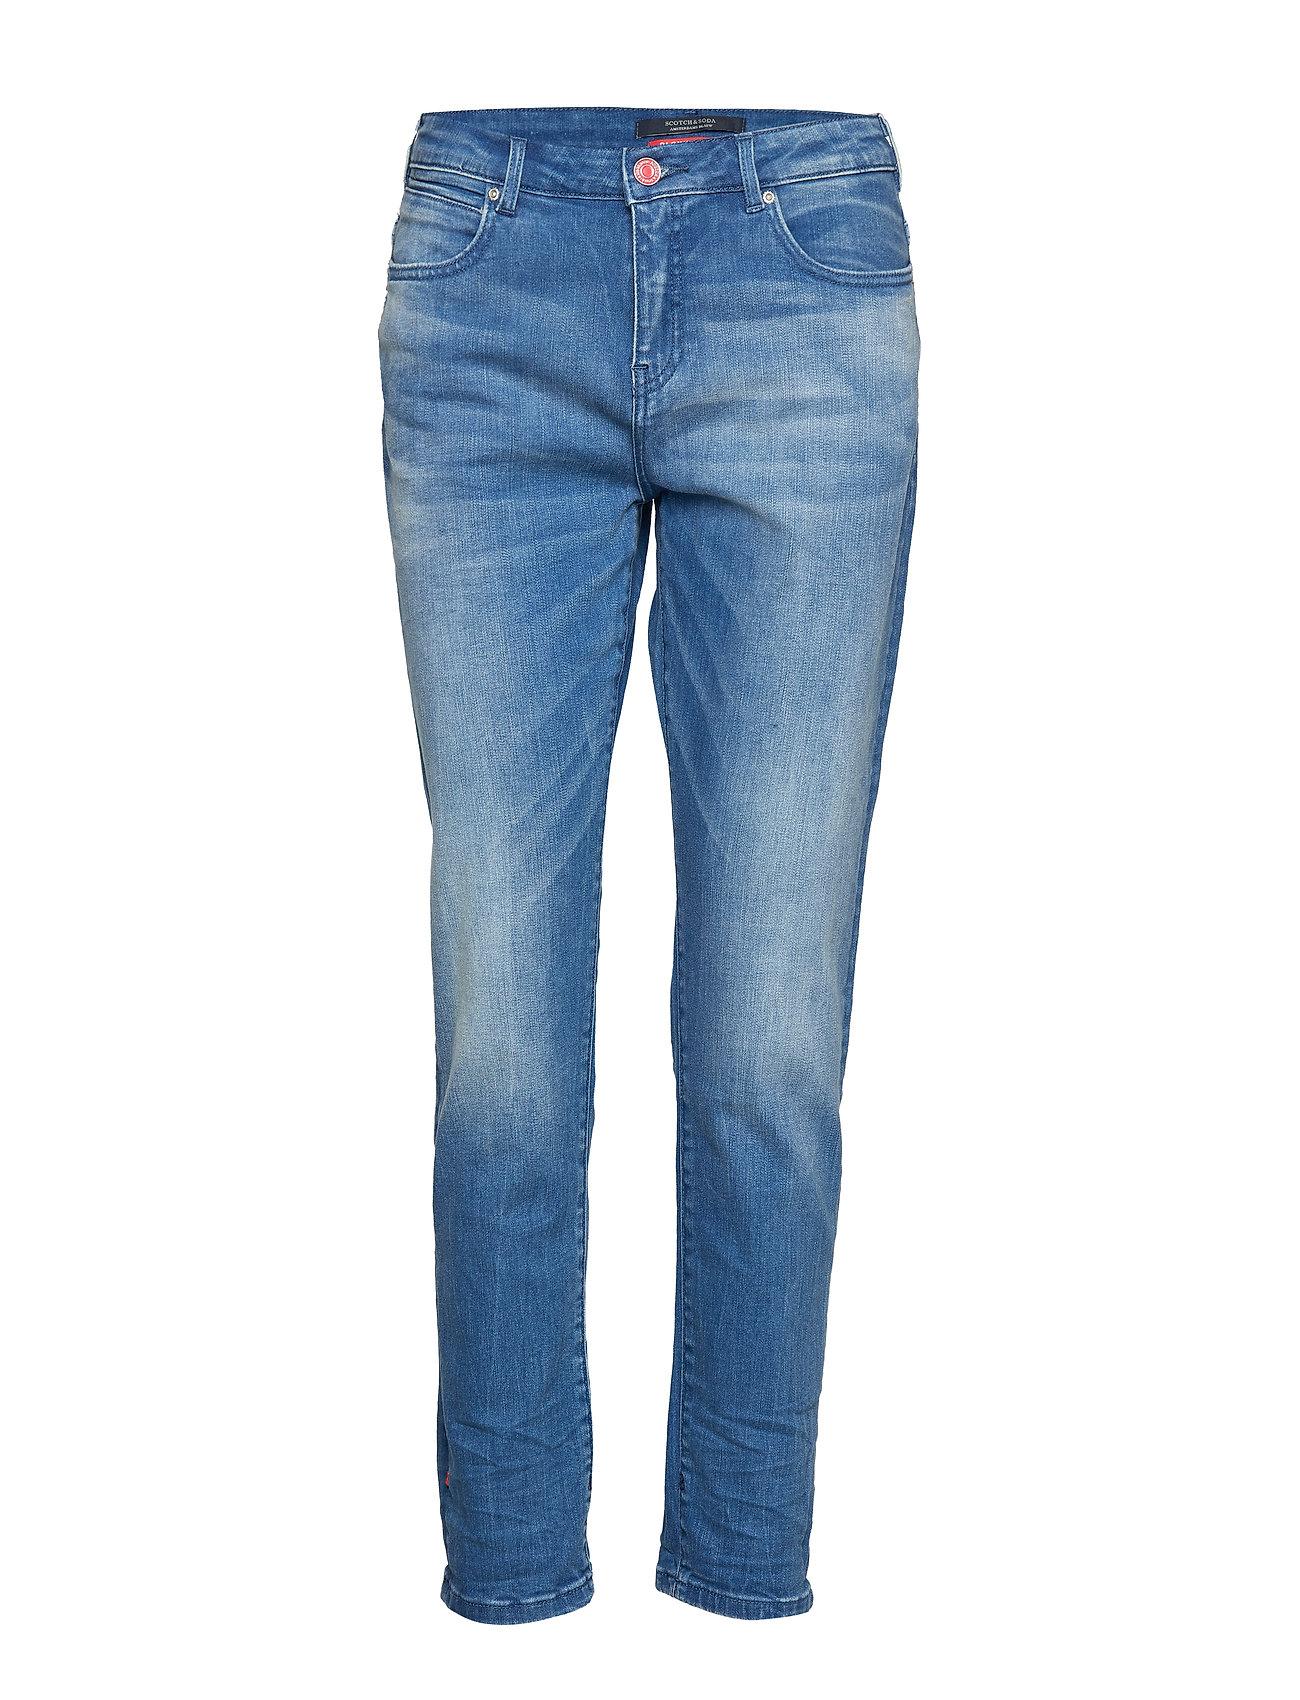 Petit Ami - Rhythm And Blauw Straight Jeans Hose Mit Geradem Bein Blau SCOTCH & SODA